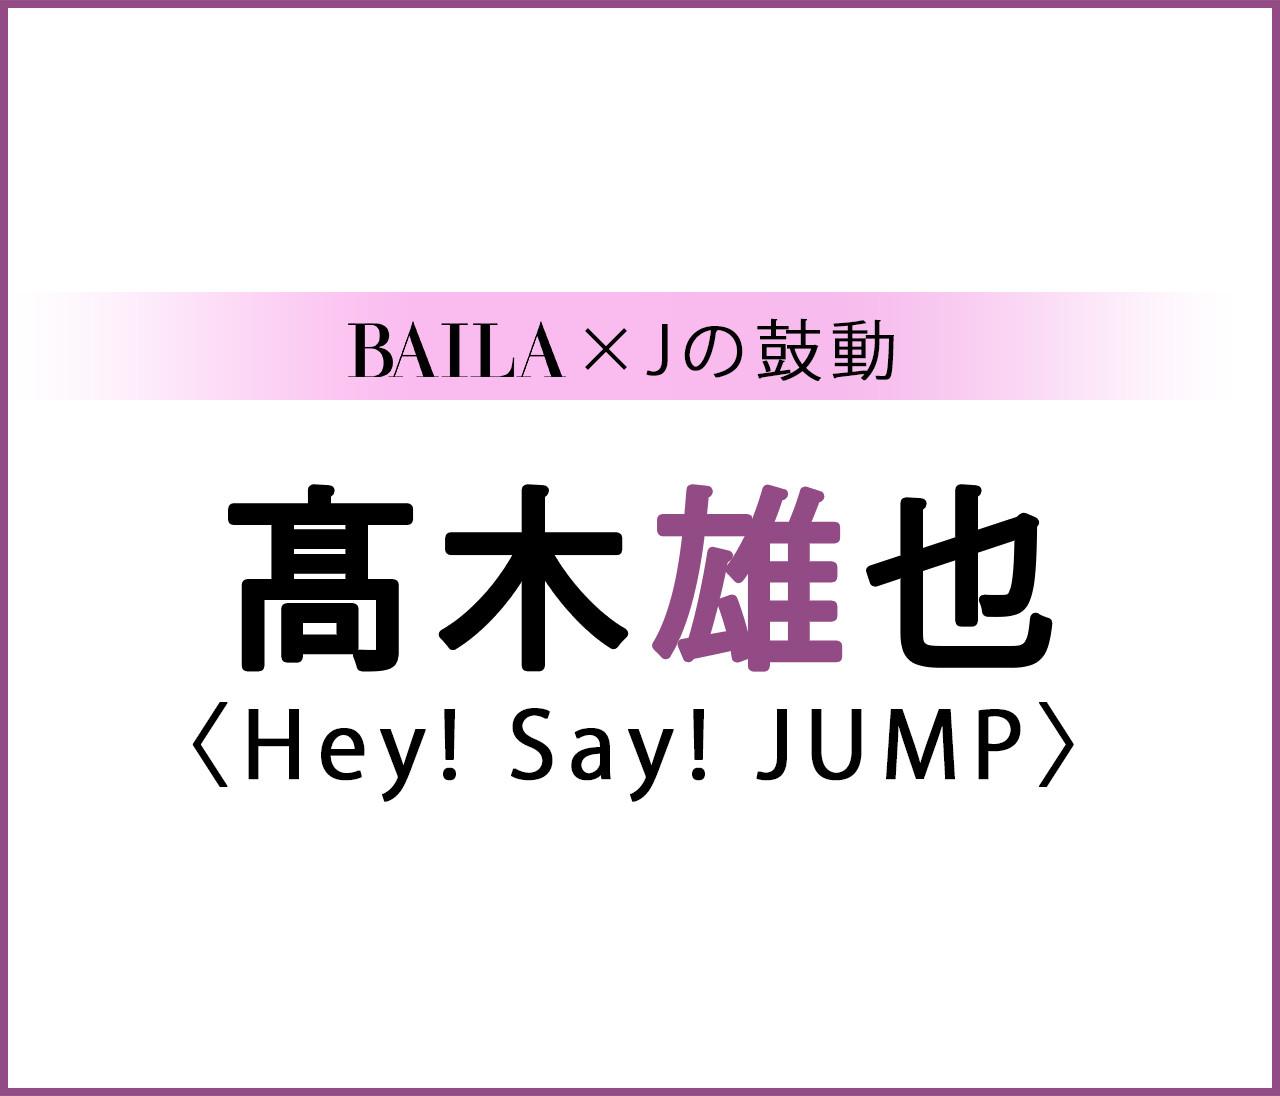 【 #HeySayJUMP #髙木雄也 】Hey! Say! JUMP 髙木雄也スペシャルインタビュー!【BAILA × Jの鼓動】